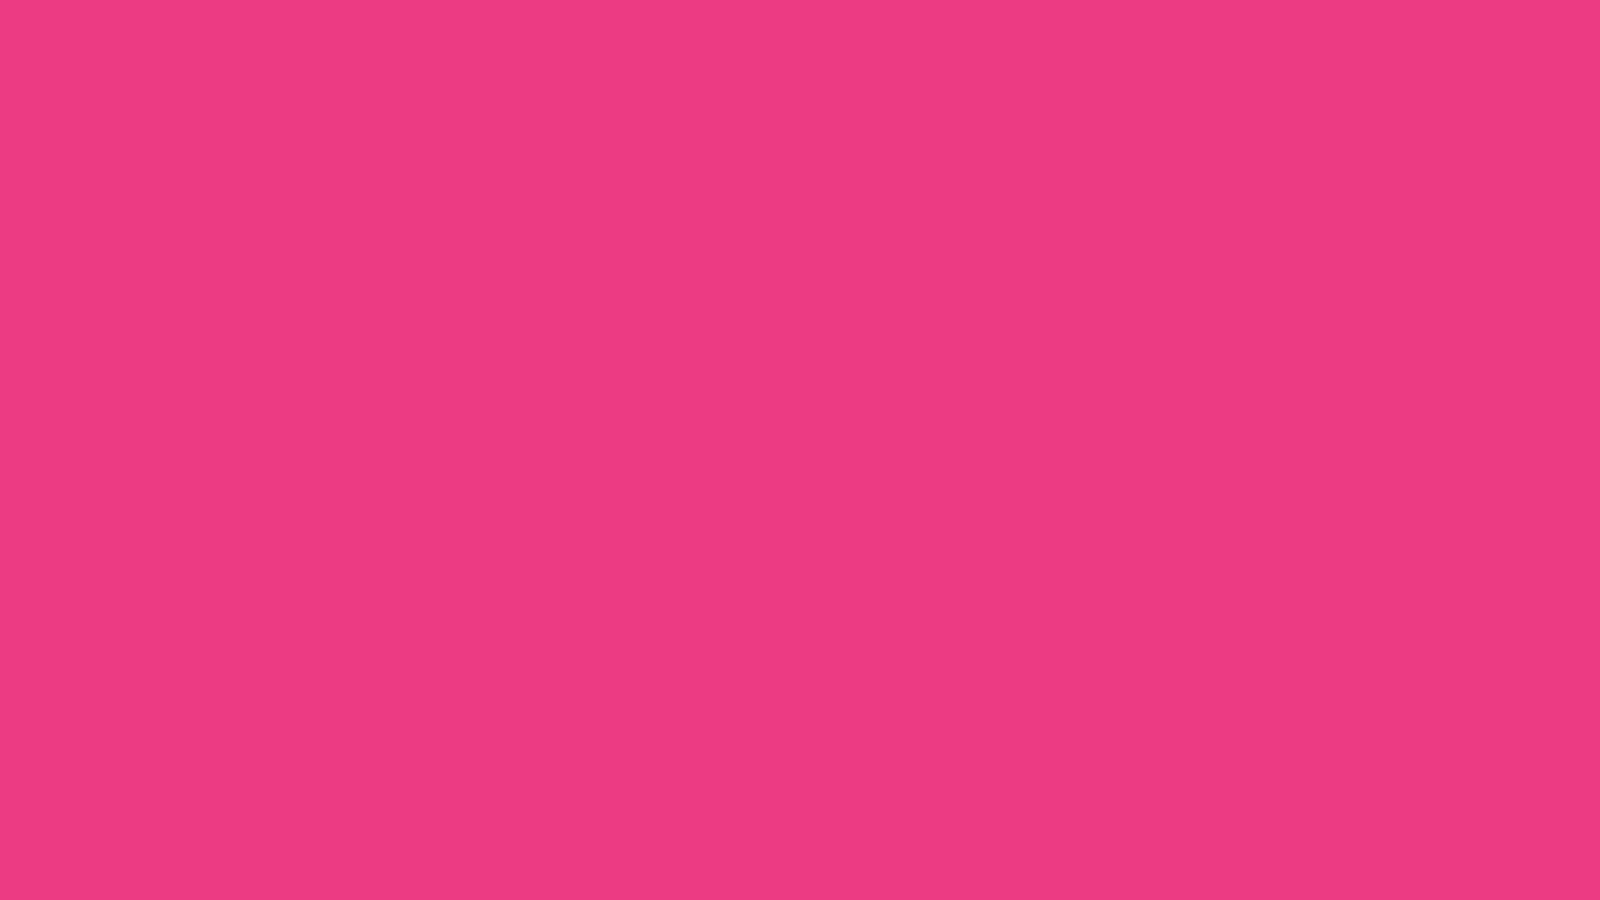 1600x900 Cerise Pink Solid Color Background